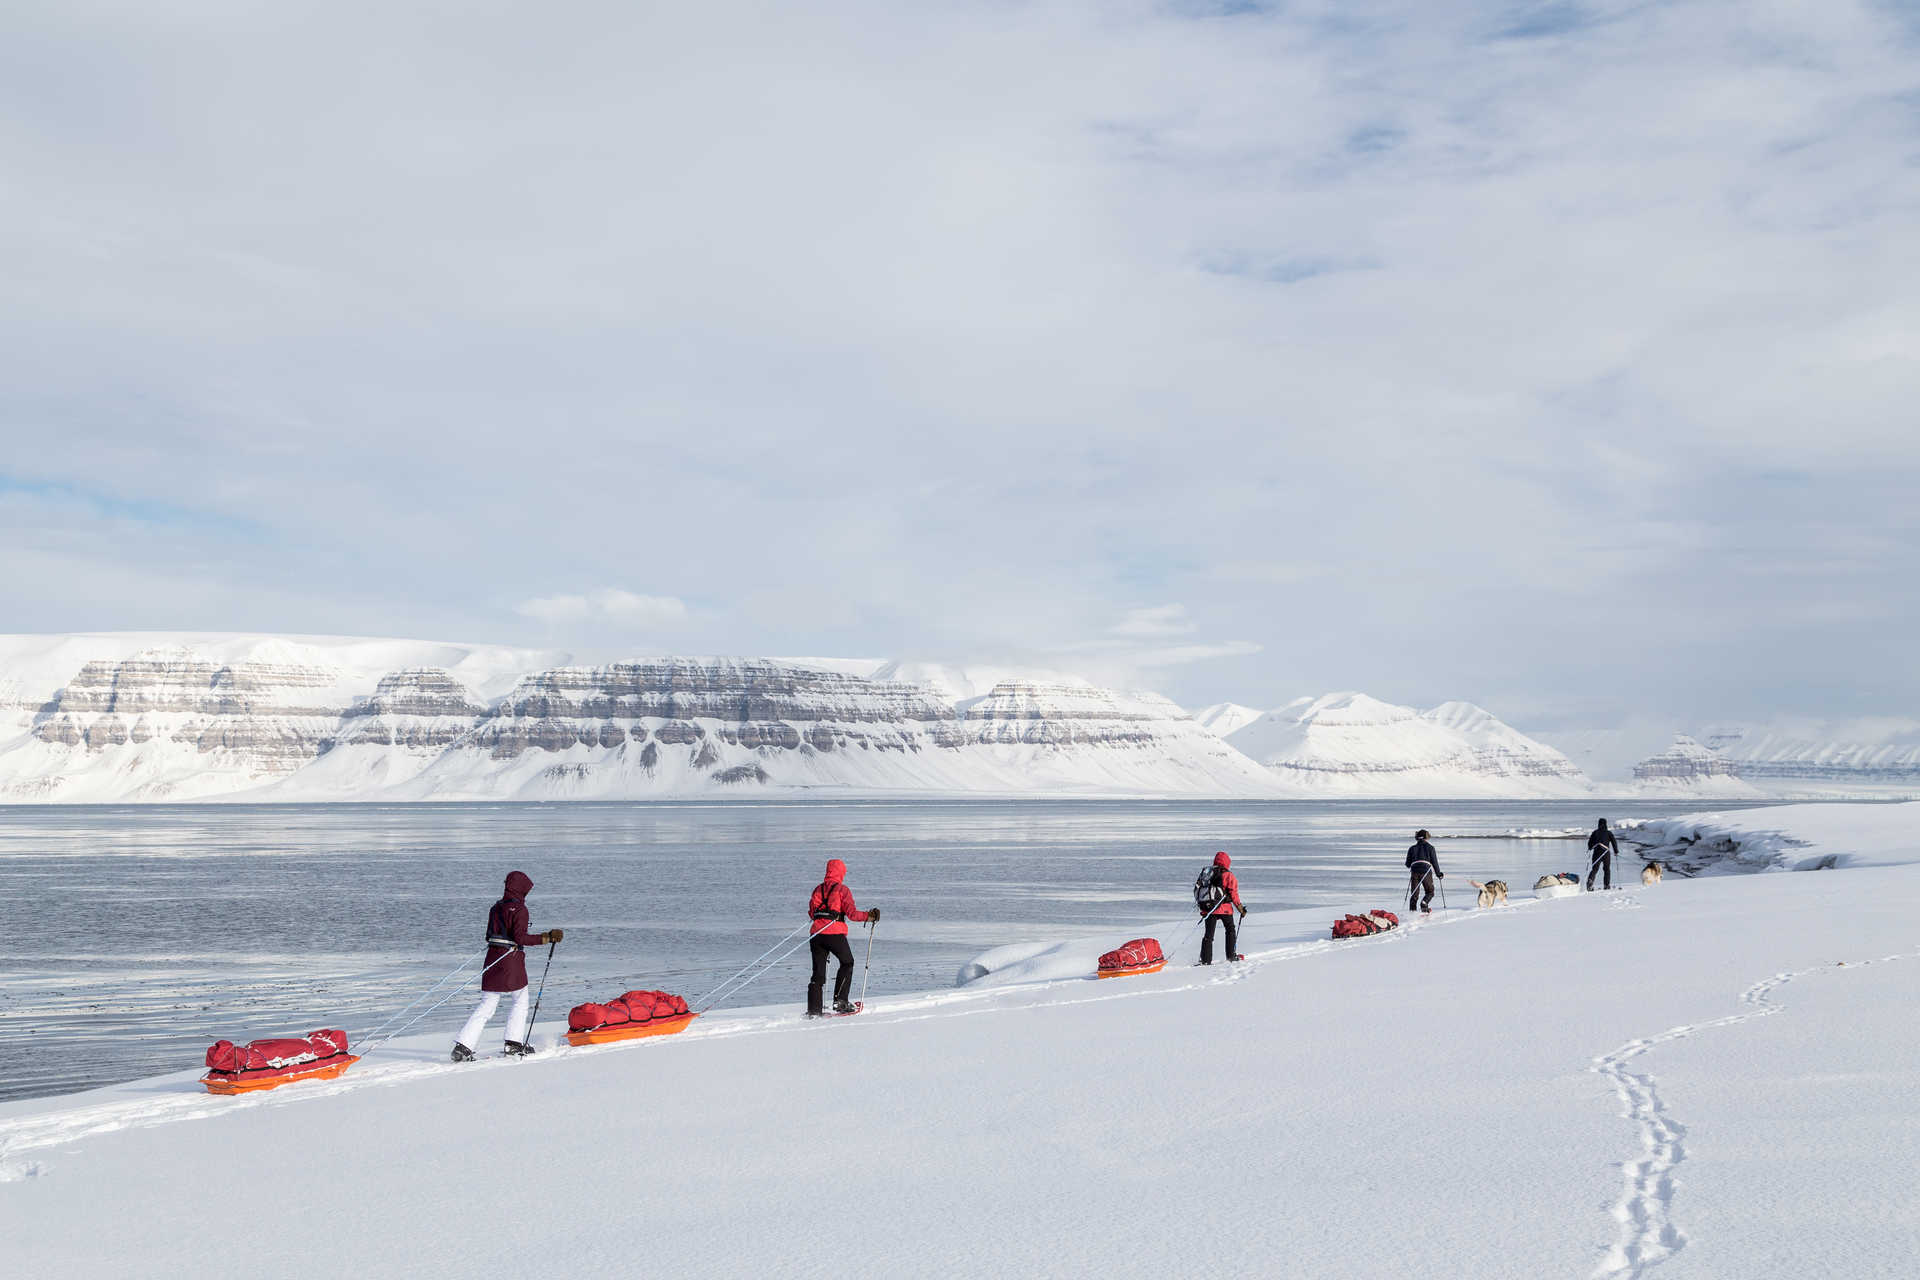 Voyage pays nordique hiver Svalbard